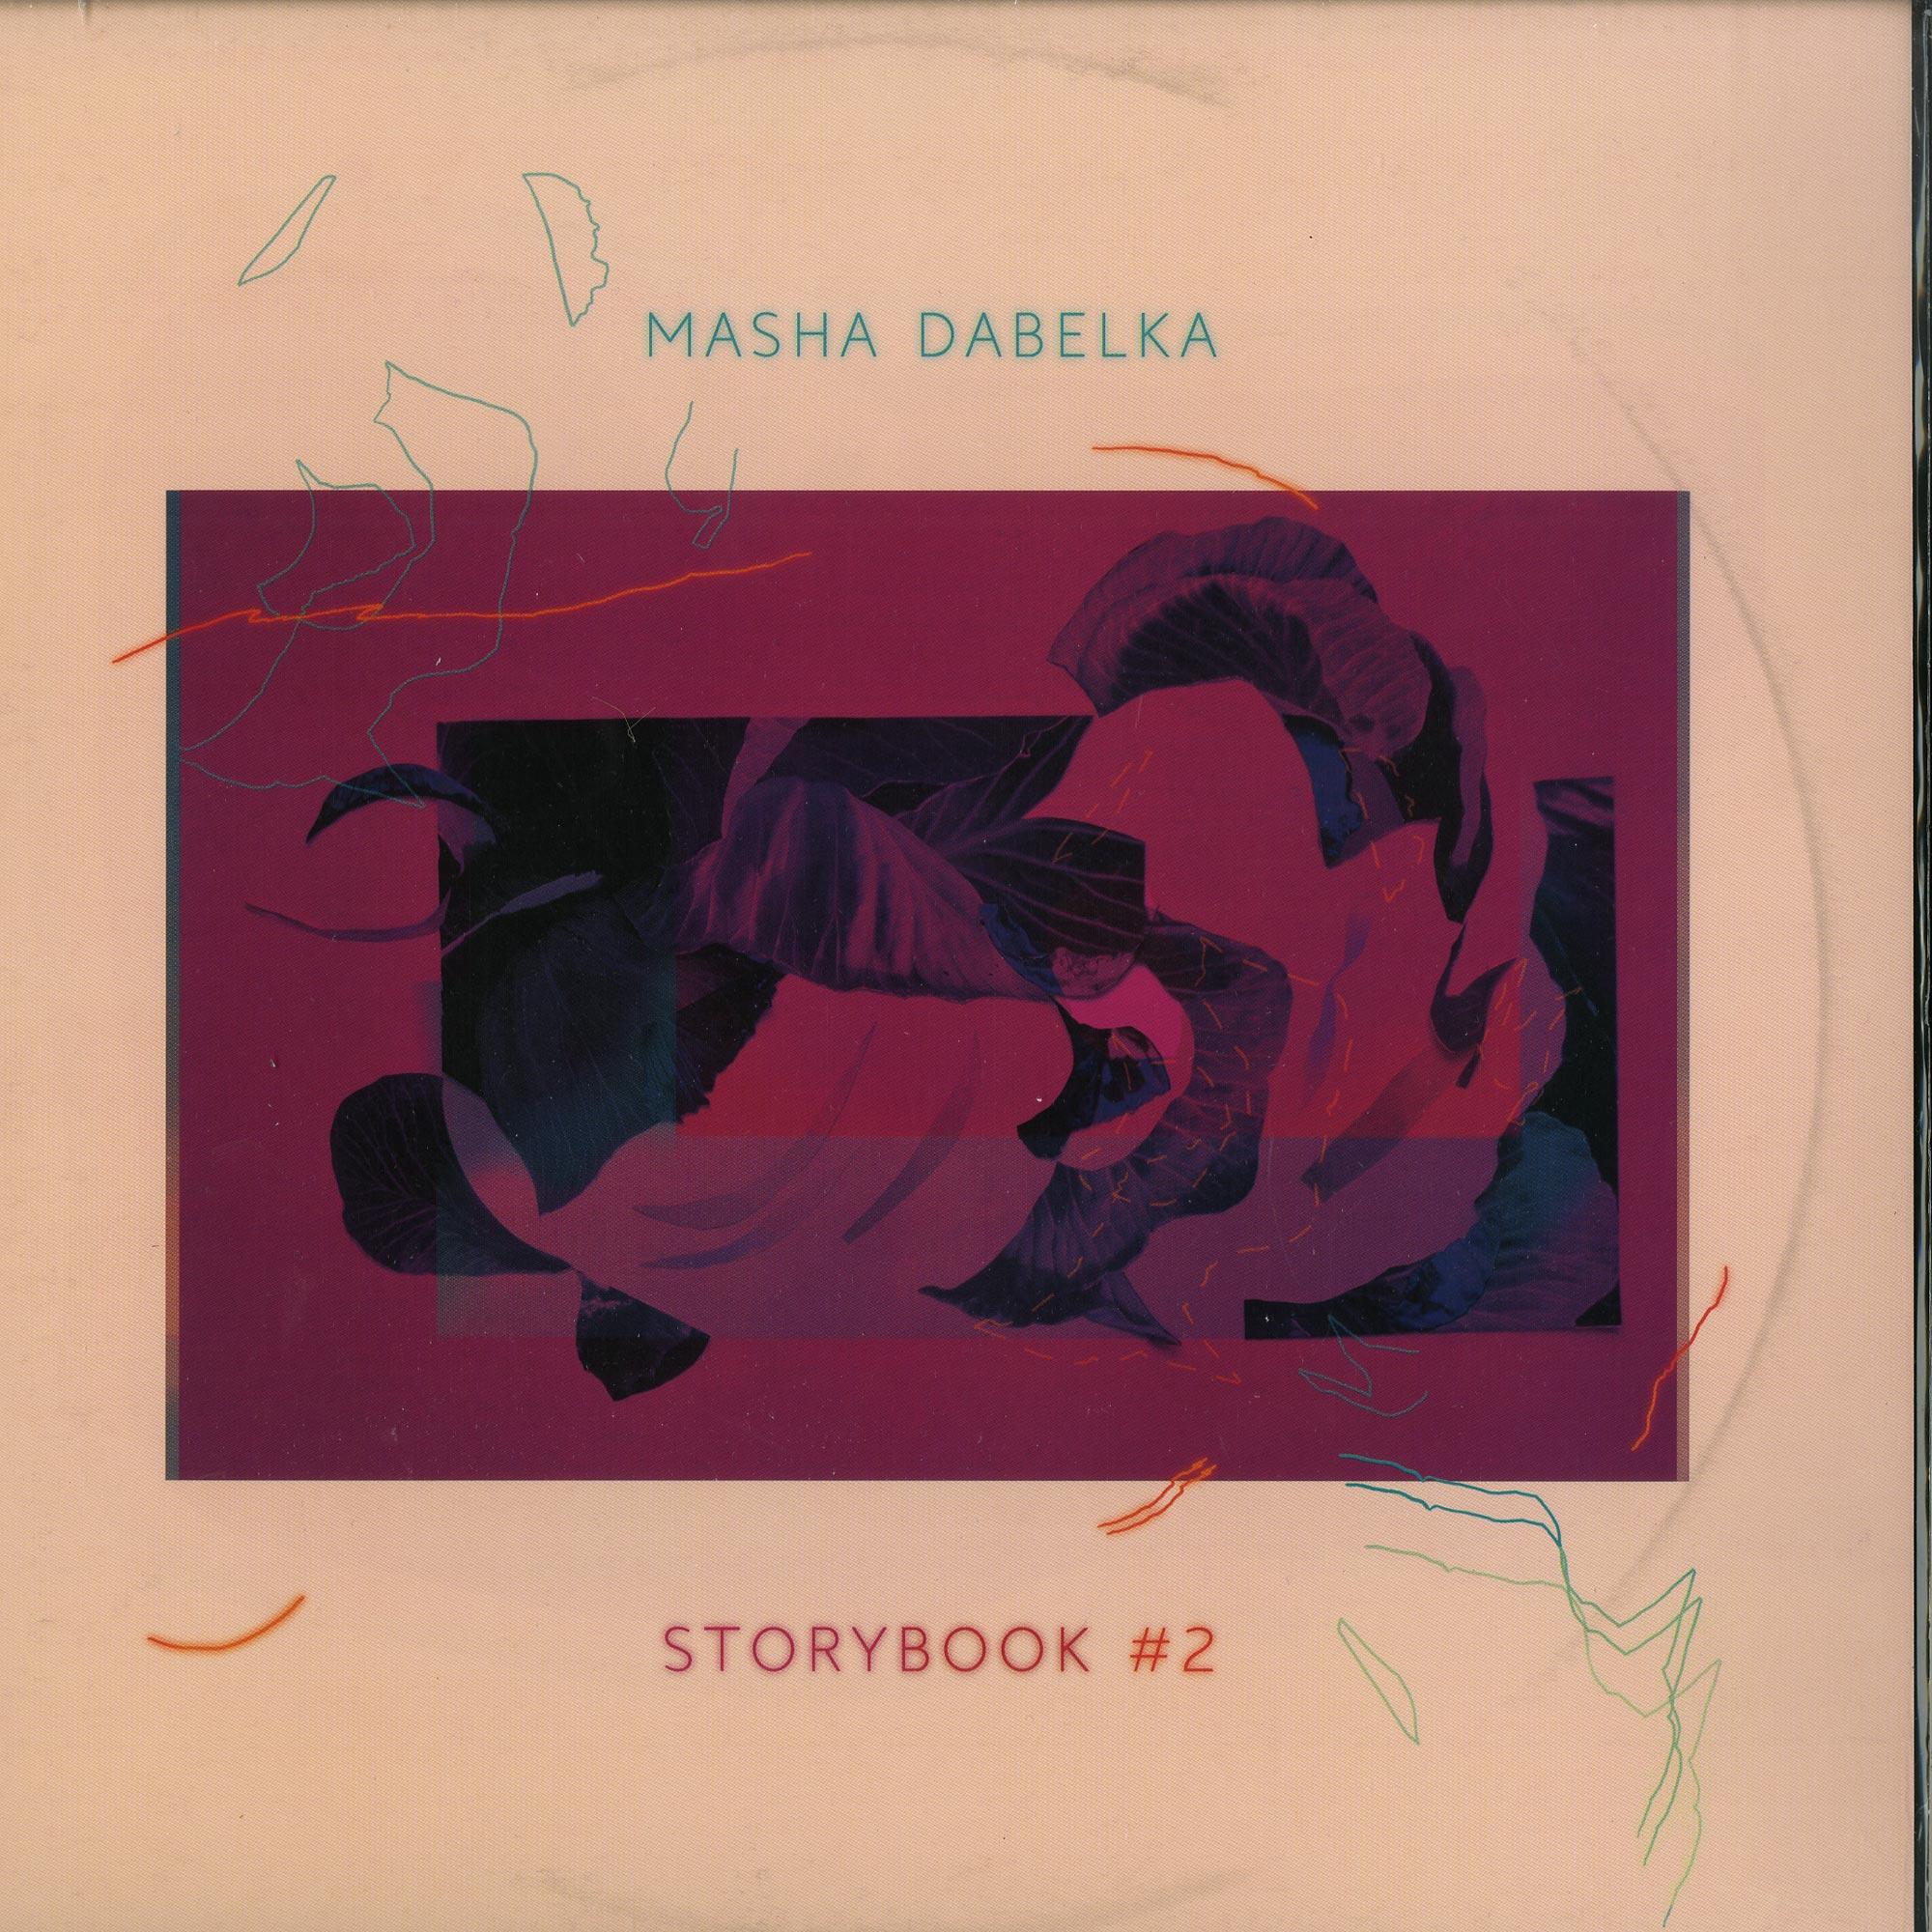 Masha Dabelka - STORYBOOK 2